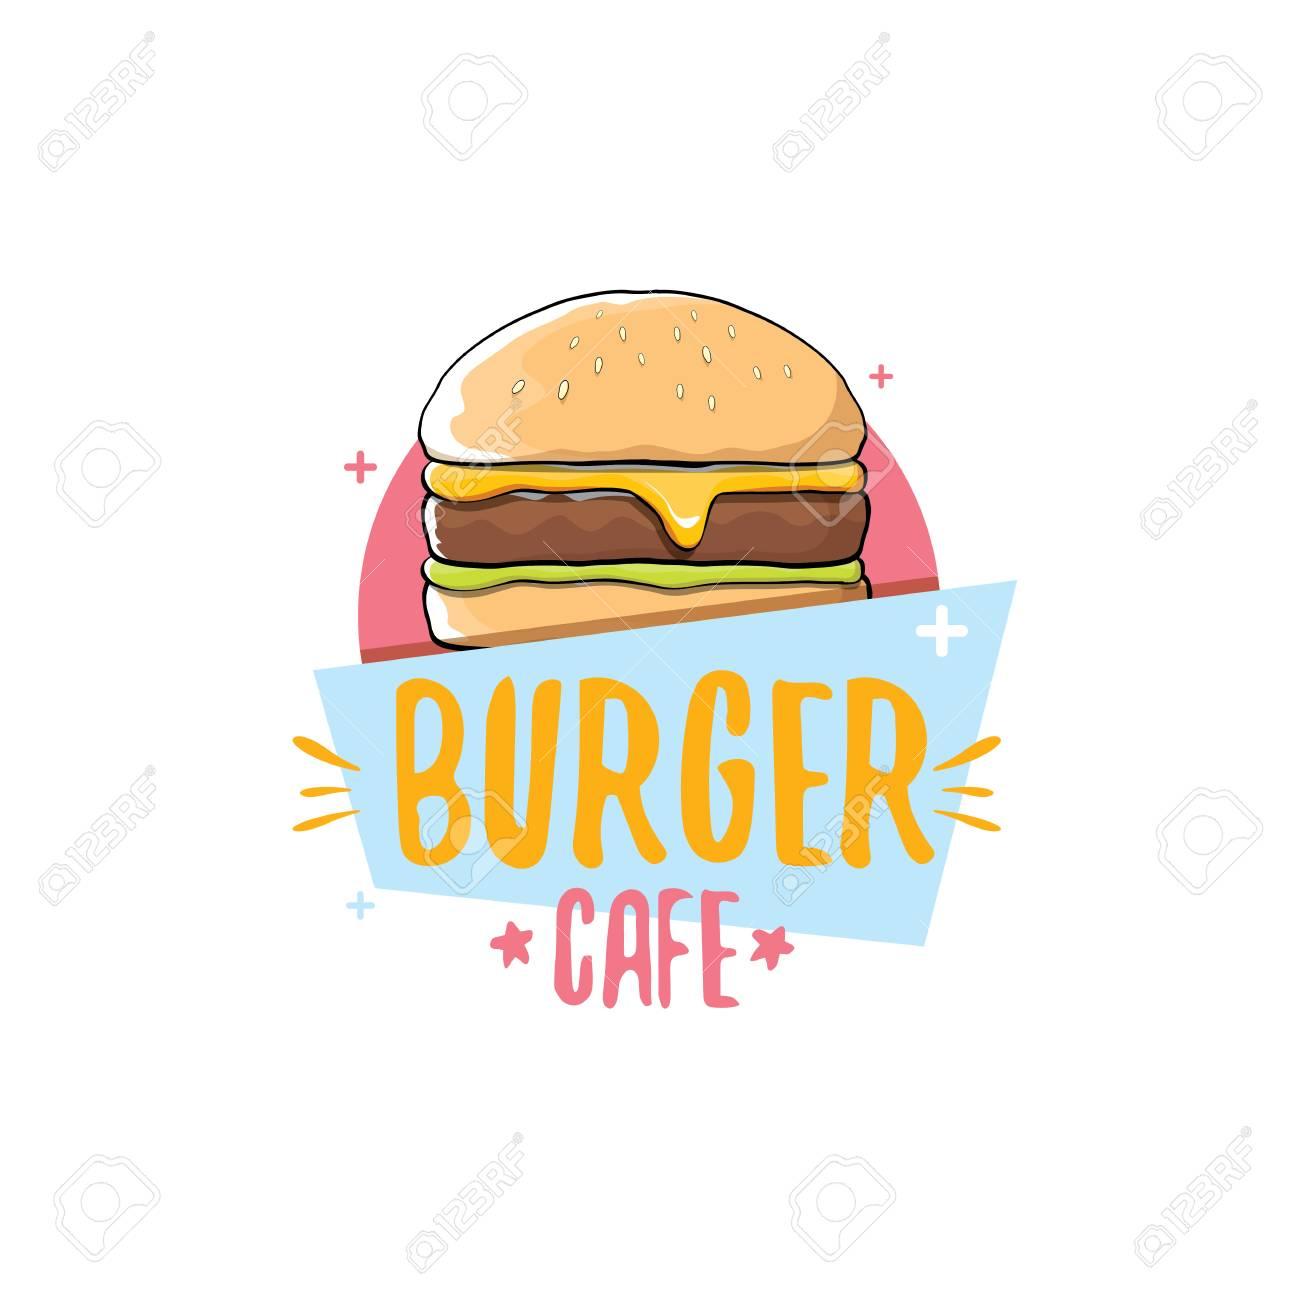 Vektor-Cartoon-Burger-Café-Logo-Design-Vorlage Mit Hamburger. Label ...